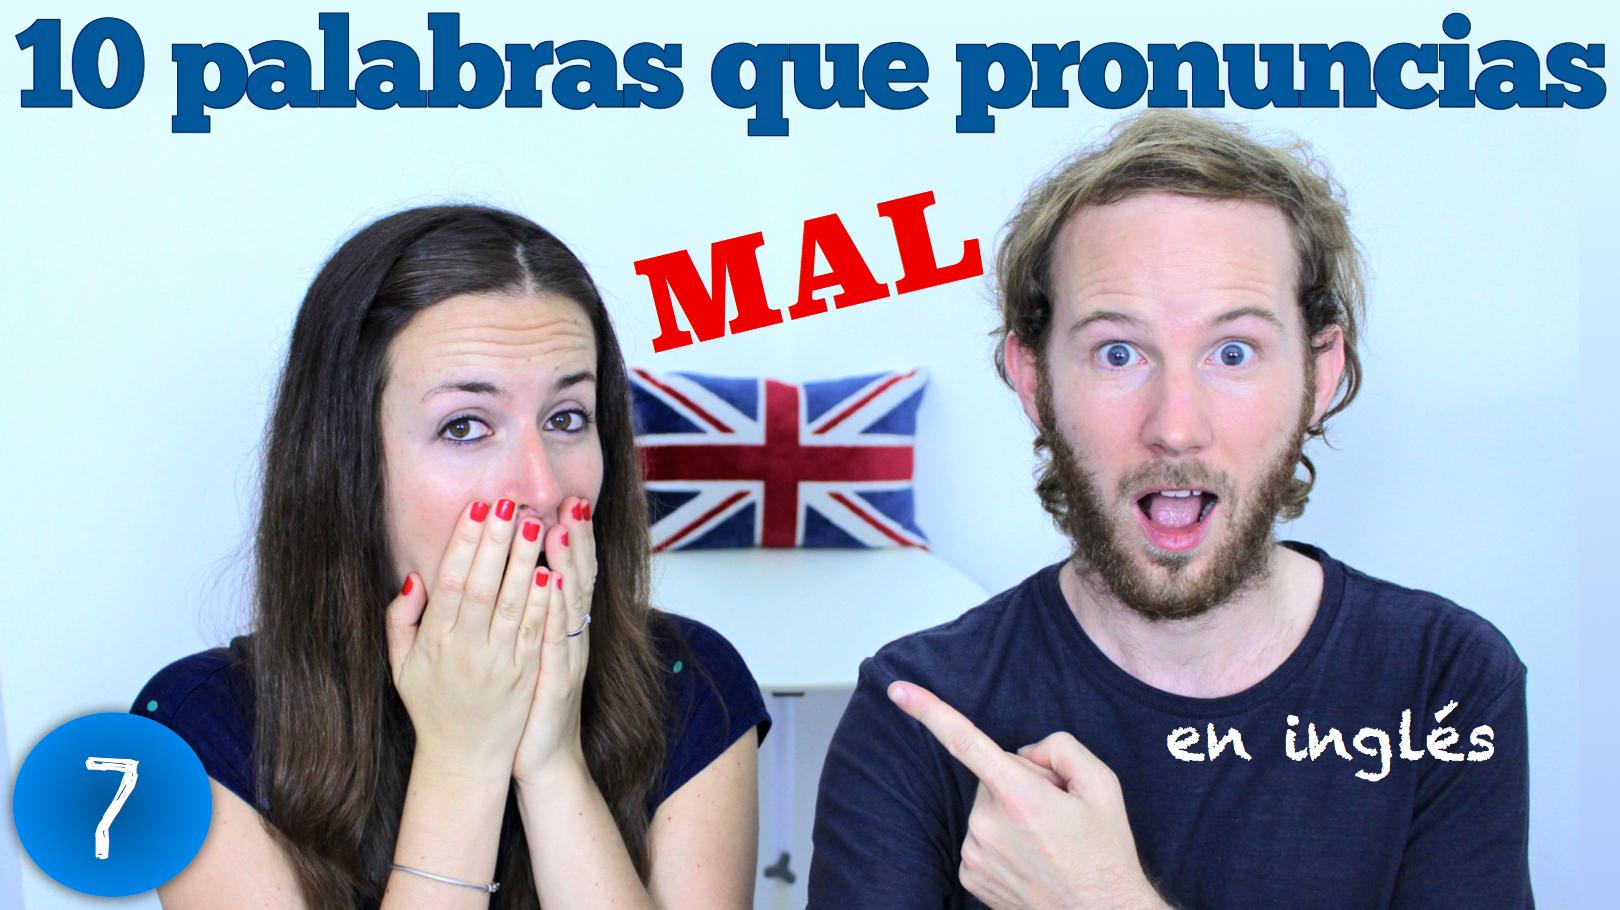 10 palabras que pronuncias mal – Fonética Inglesa